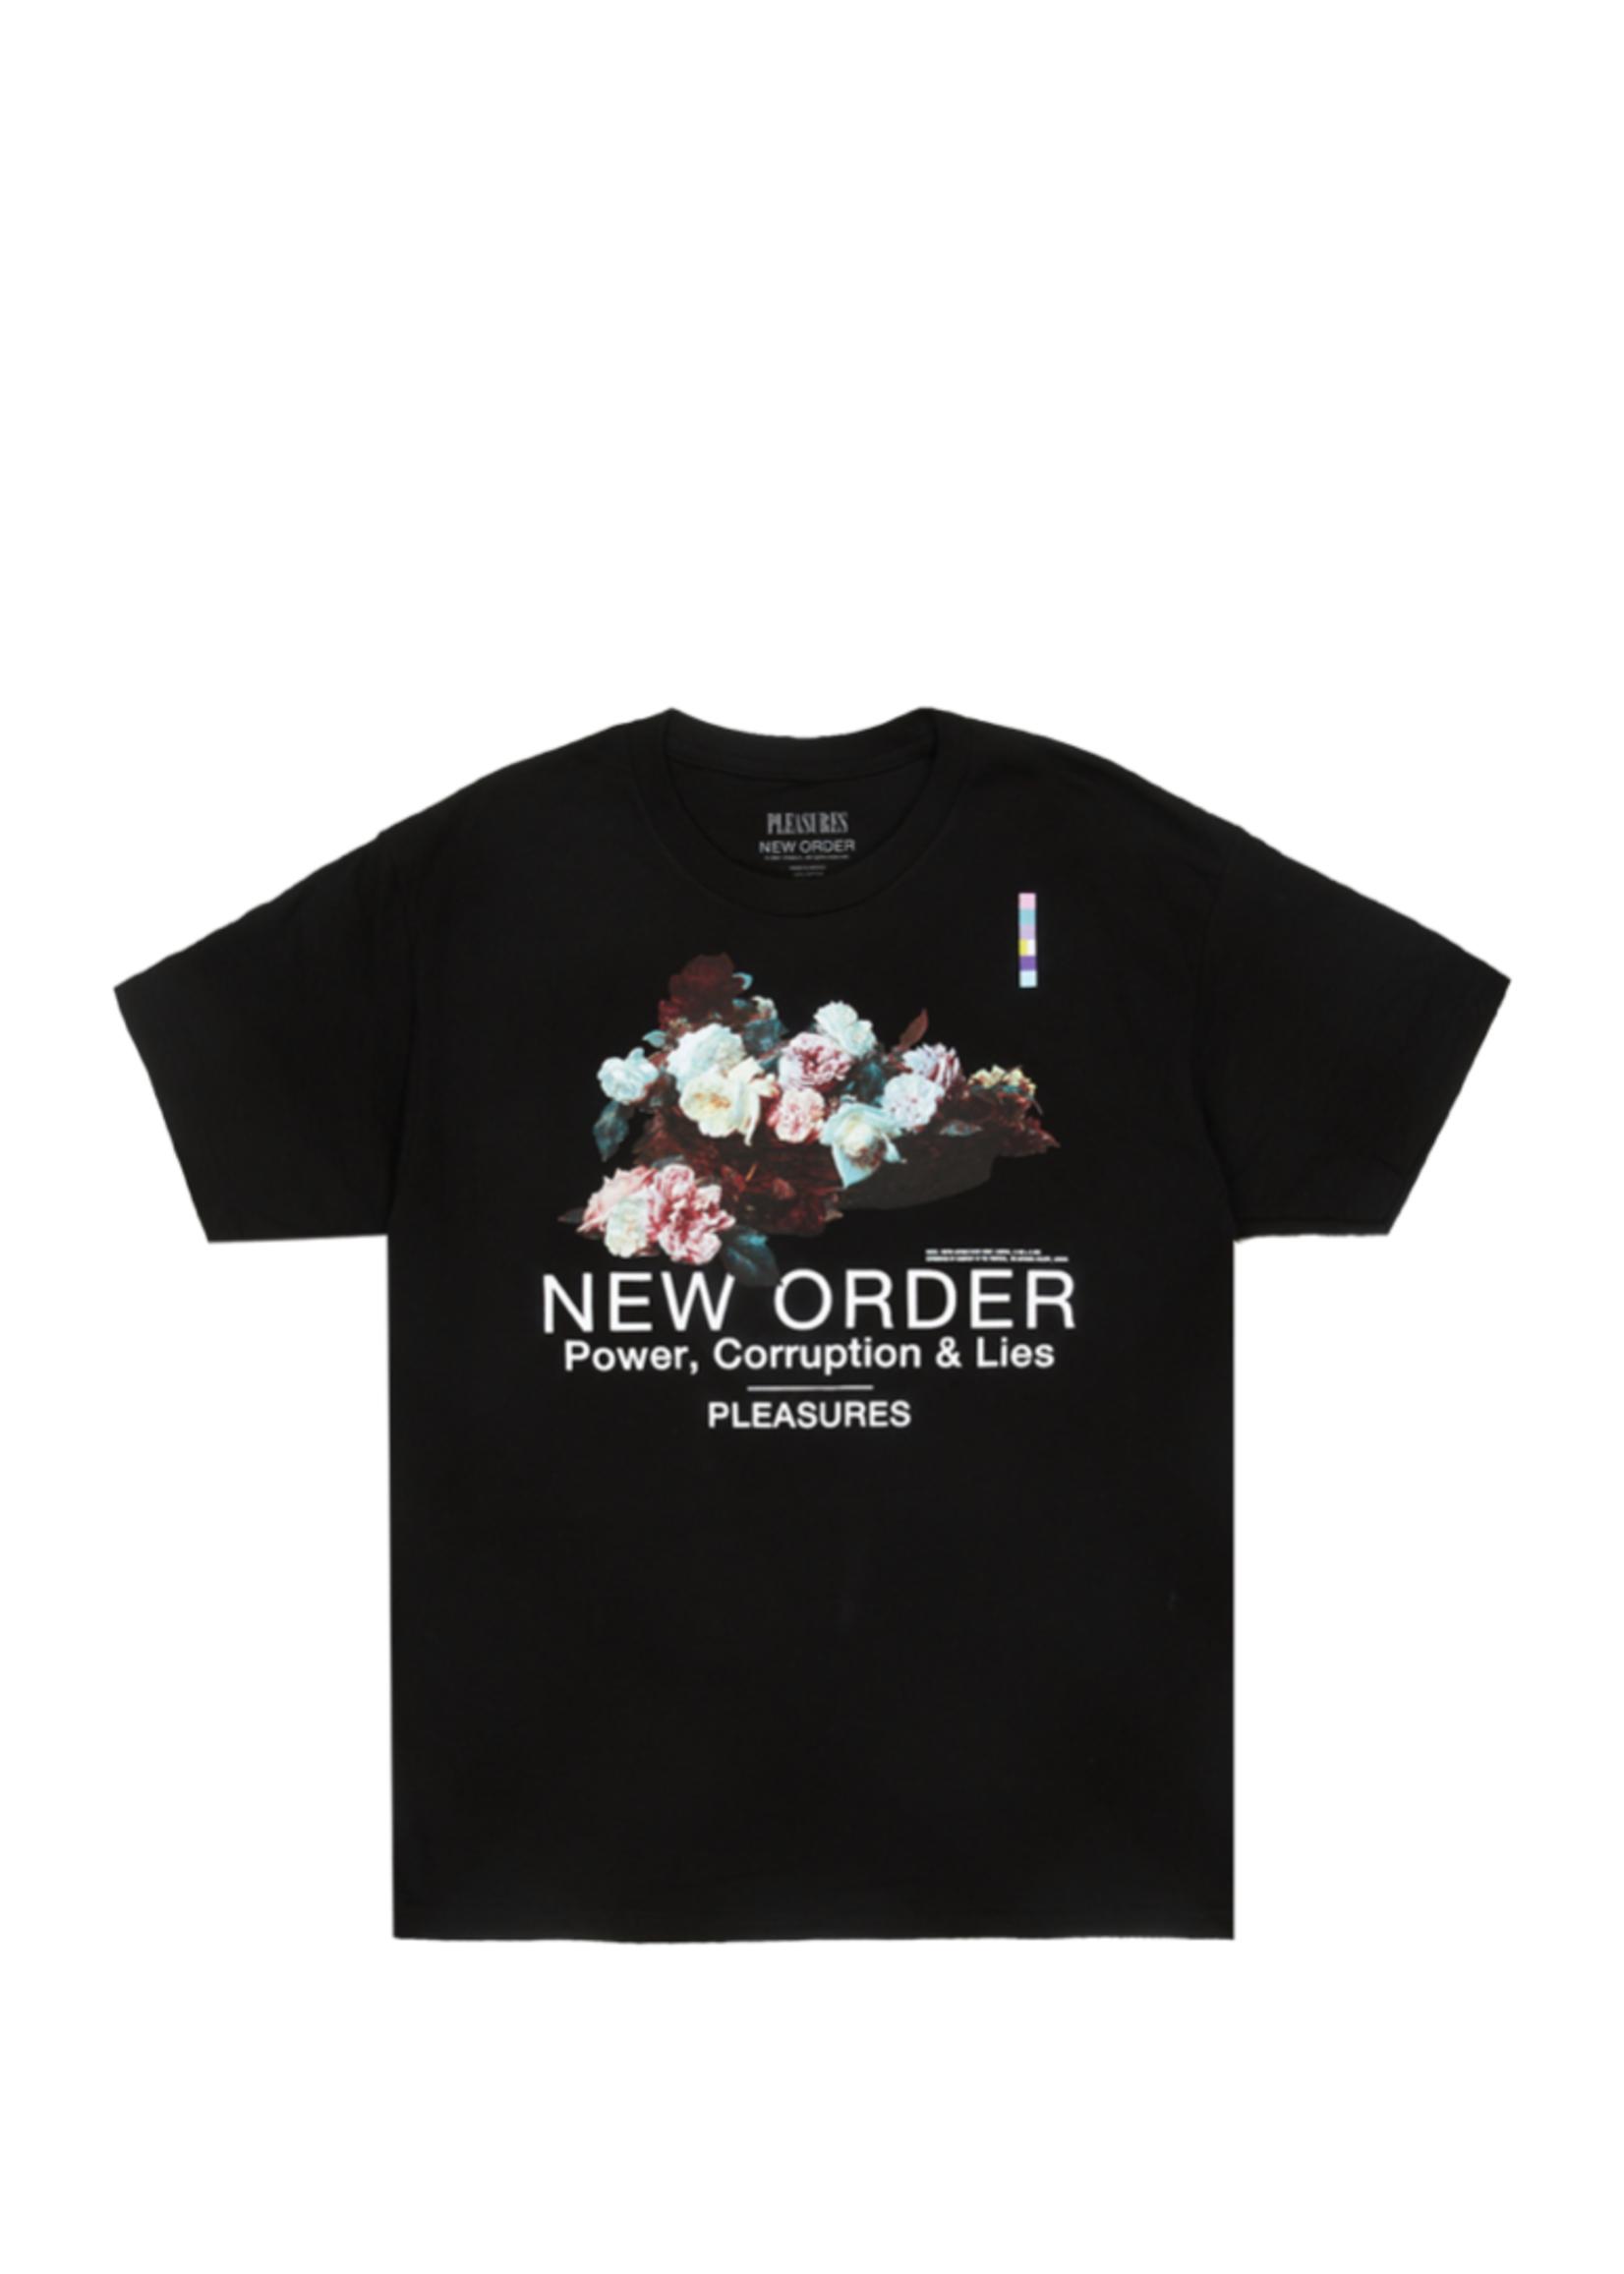 PLEASURES New Order Power T-shirt in Black